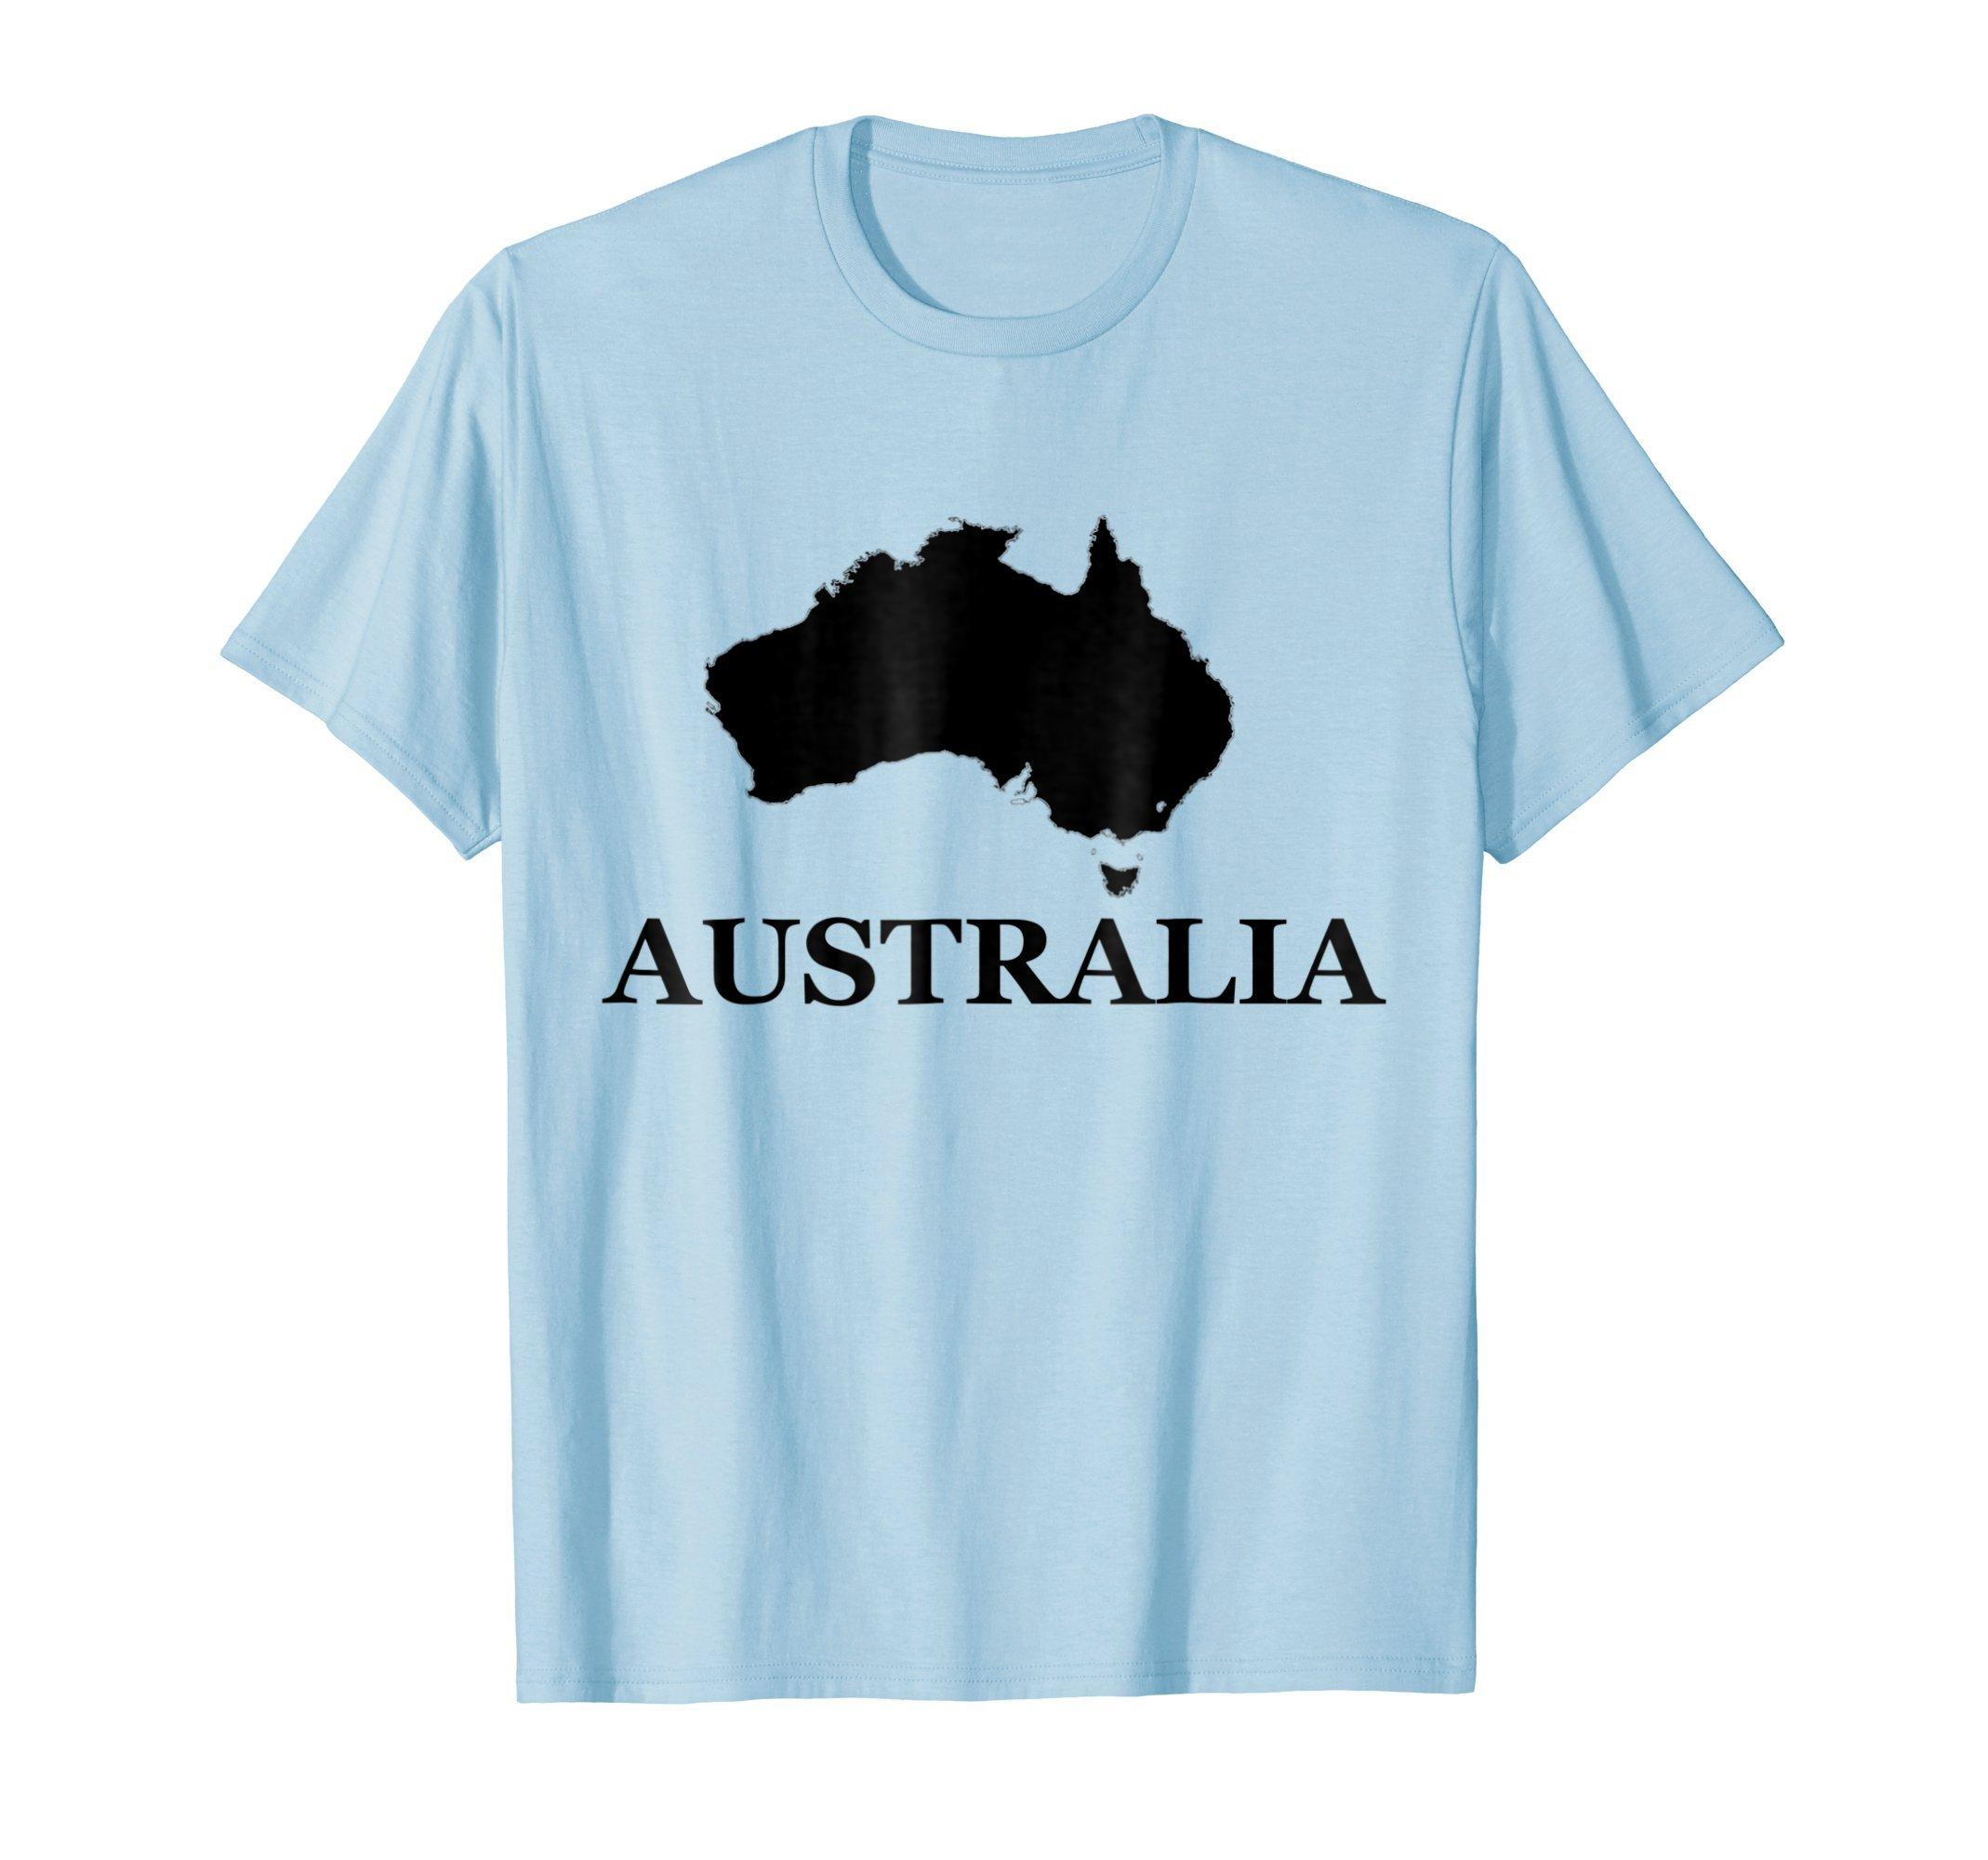 Australia T-Shirt for Travel Tourist Souvenir Gift Melbourne